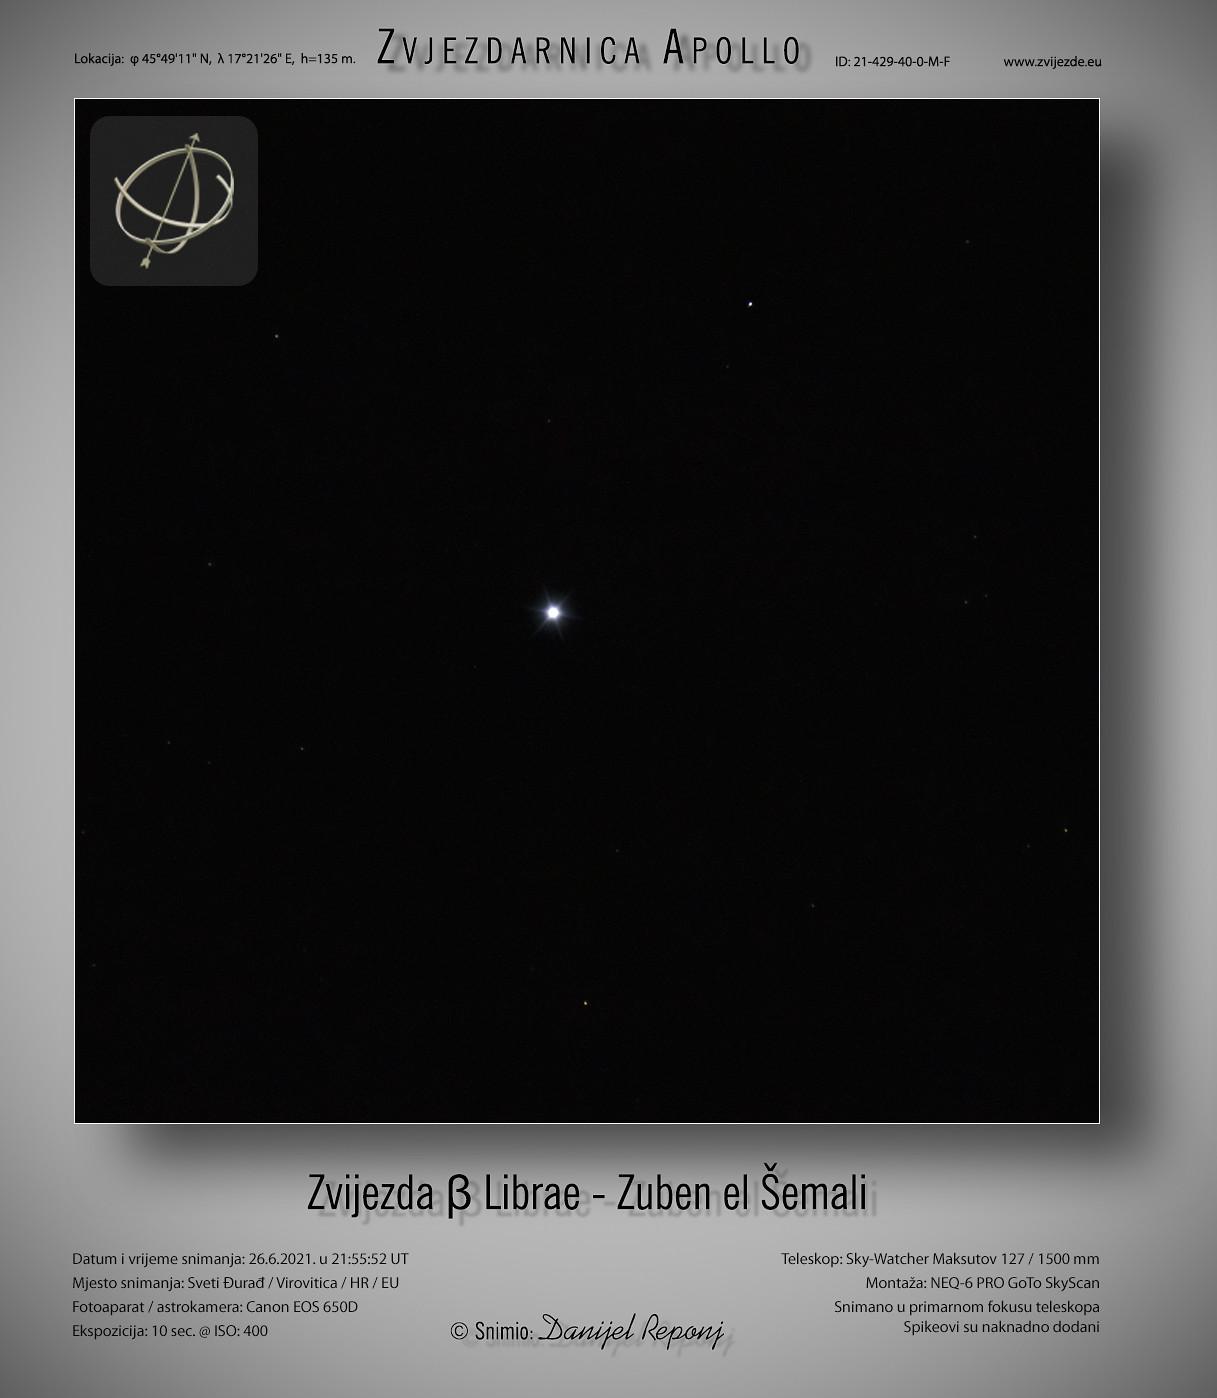 Zvijezda β Librae - Zuben el Šemali, 26.6.2021.